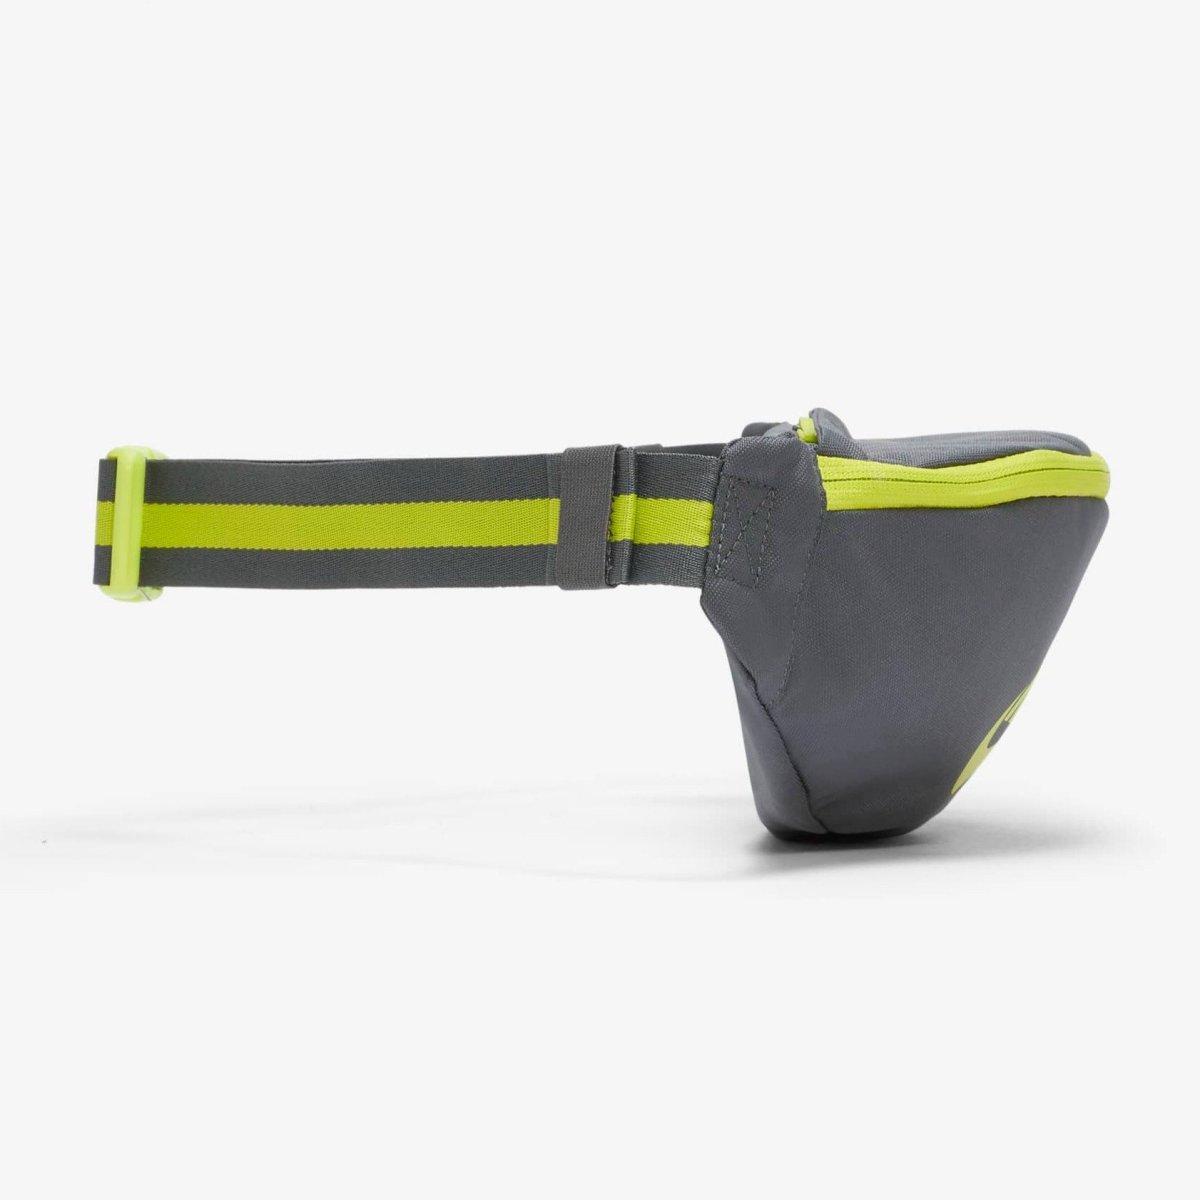 Nike-Heritage-Fanny-pack-Iron-Grey-Cyber-Green-BA5750-068-3_1024x1024@2x